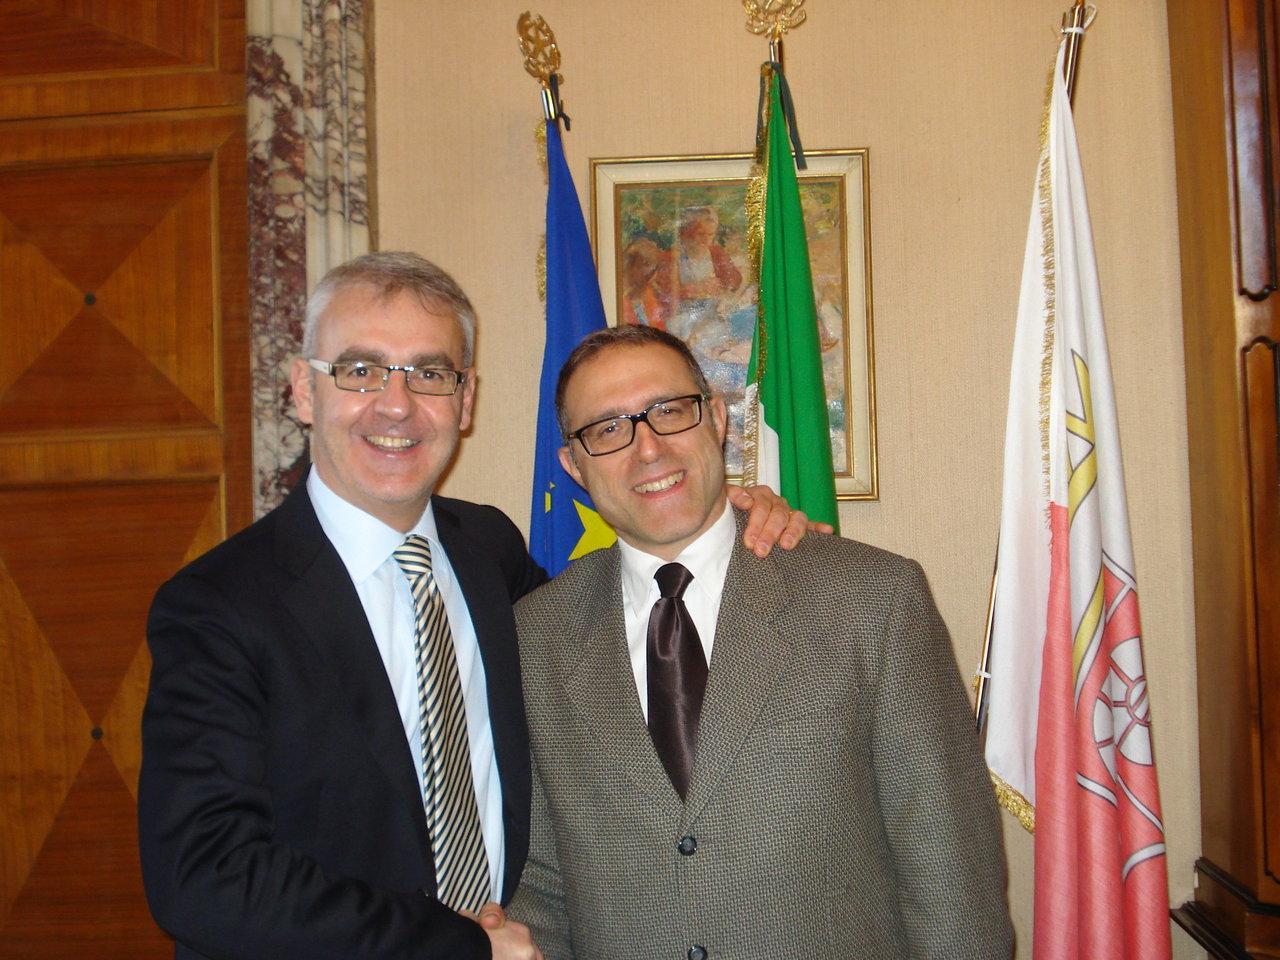 antonio-le-donne-con-il-sindaco-carancini_2gen12-11